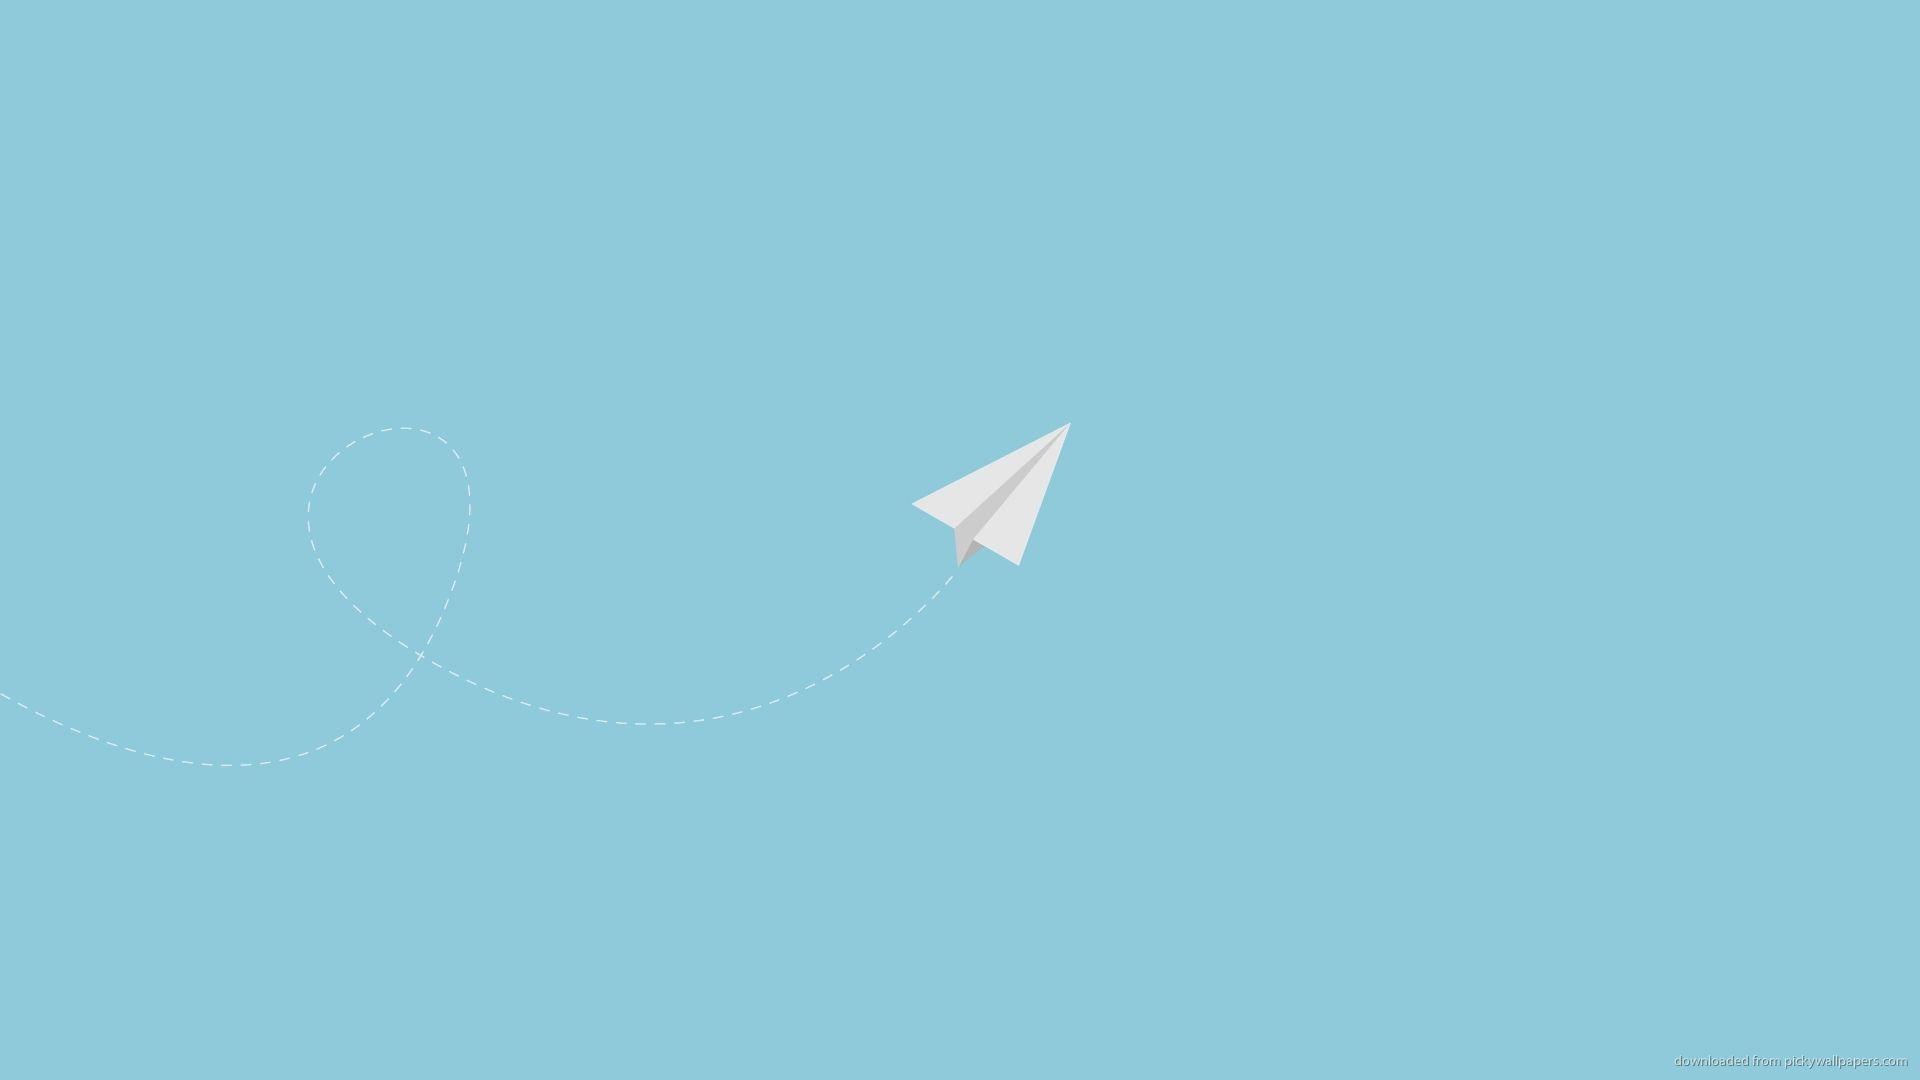 Paper Plane 1920x1080 Minimalist Desktop Wallpaper Minimal Wallpaper Minimalist Wallpaper